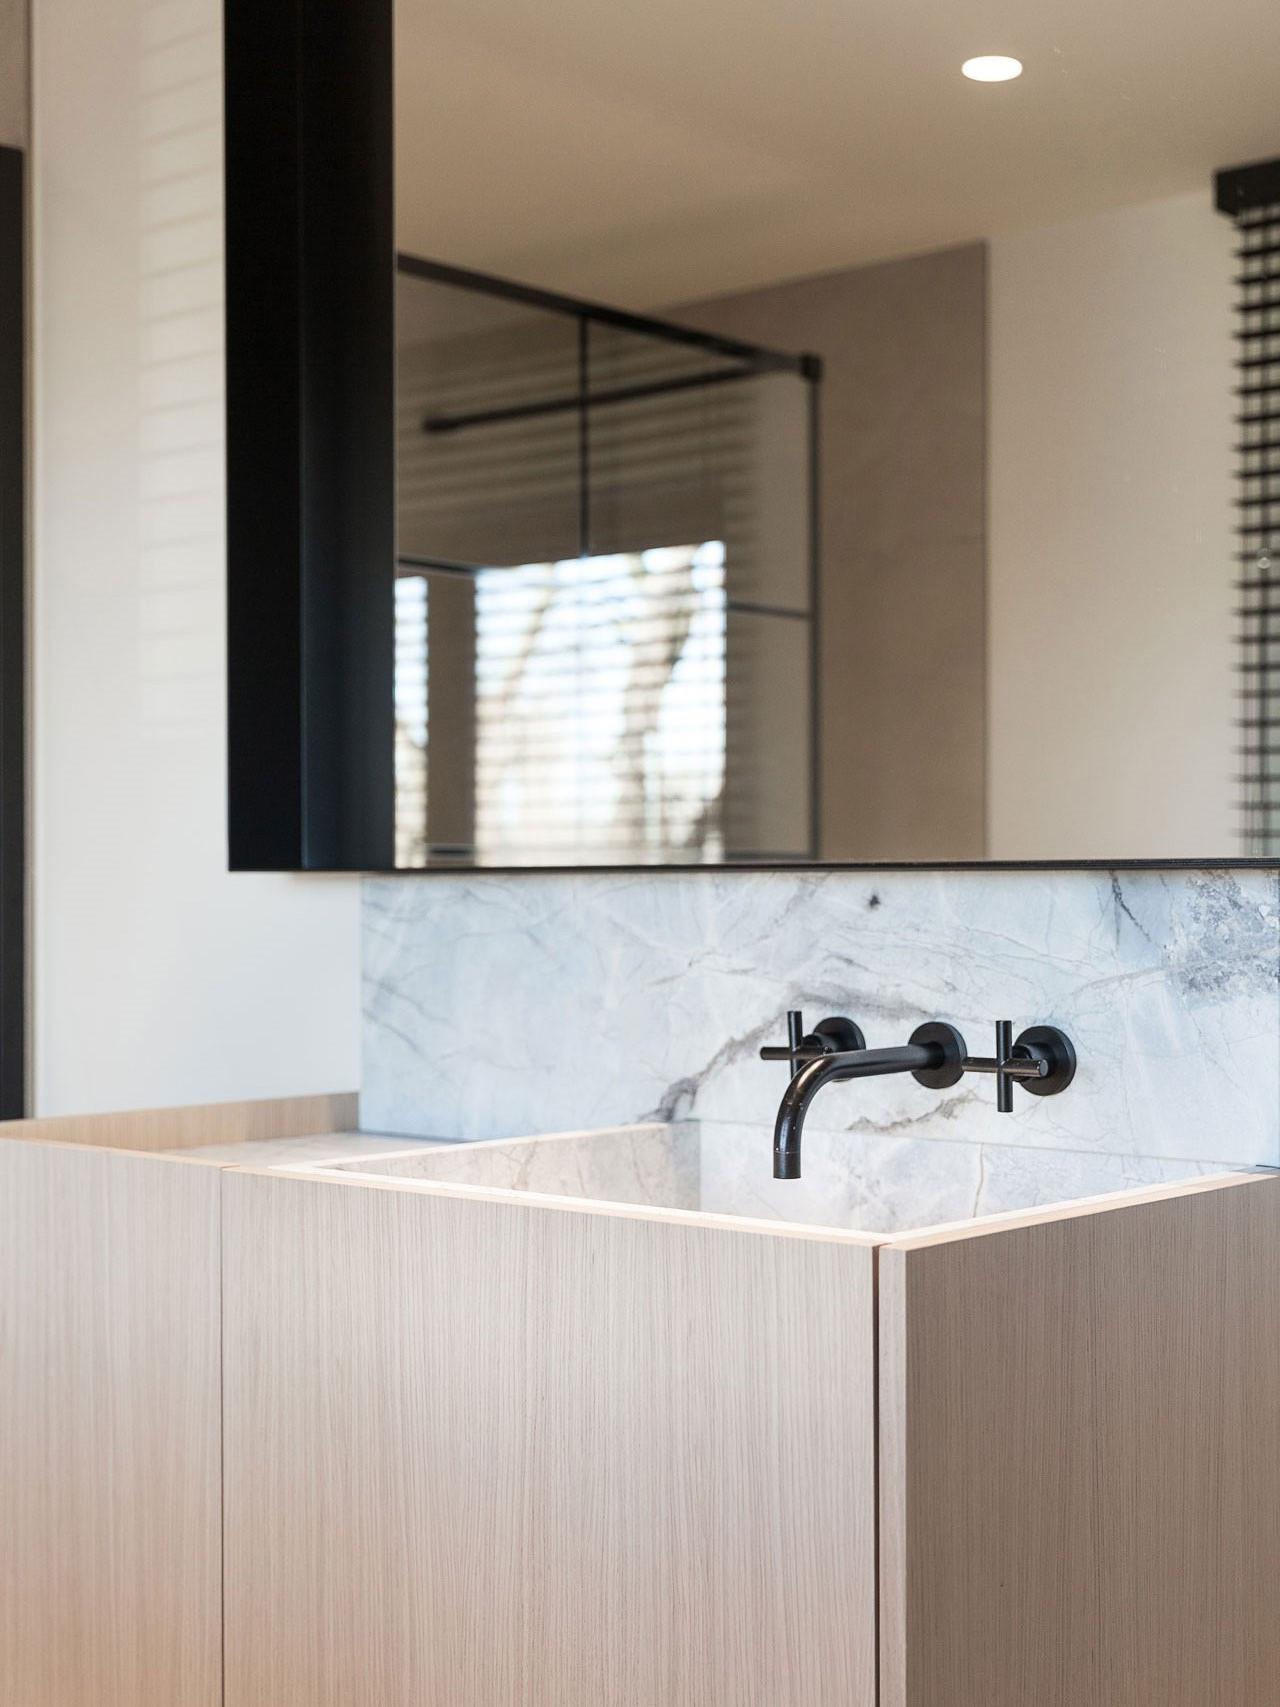 totaalinrichting-badkamer-haard-vestiaire-marmer-5.jpg